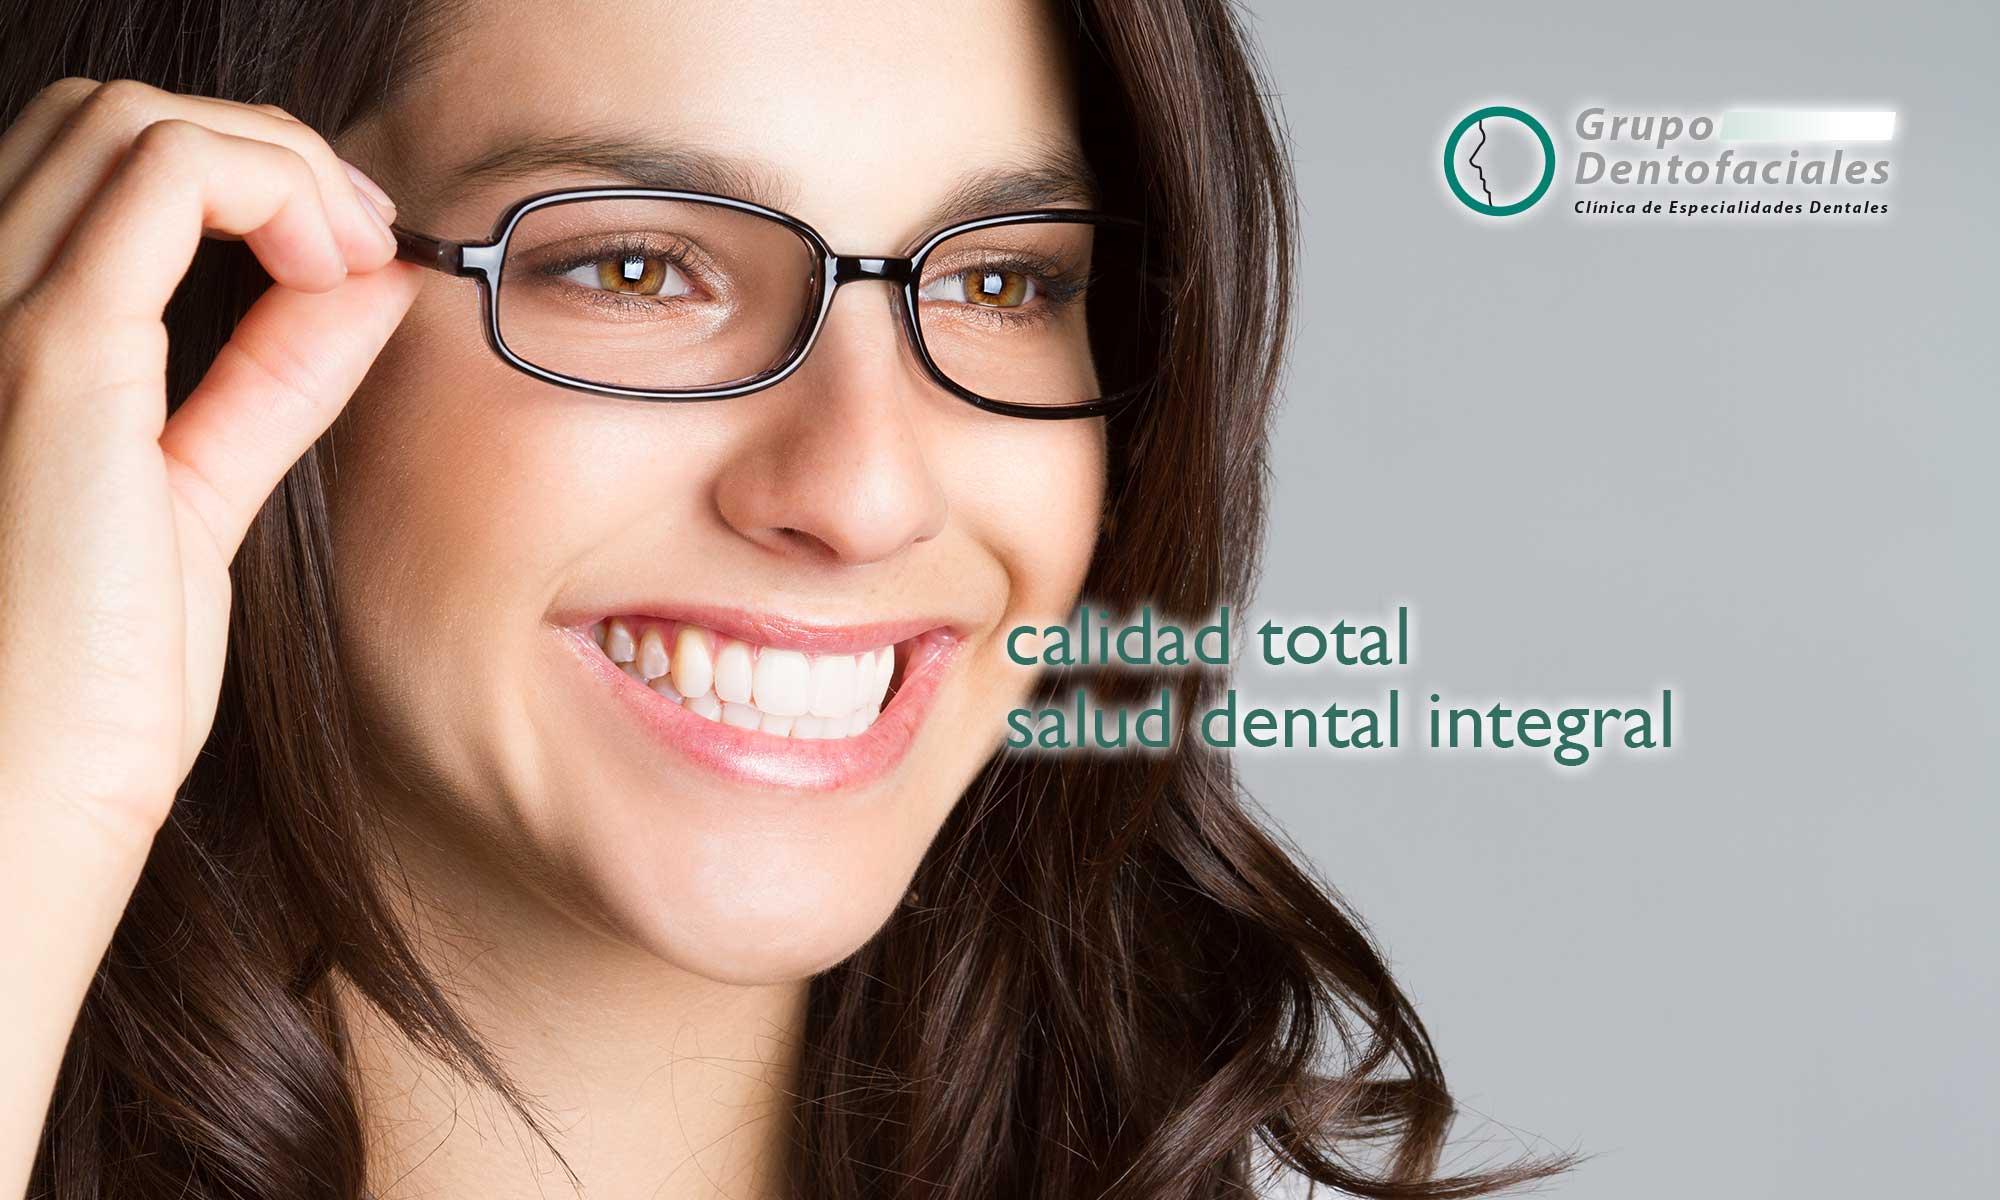 Implante dental costo cdmx